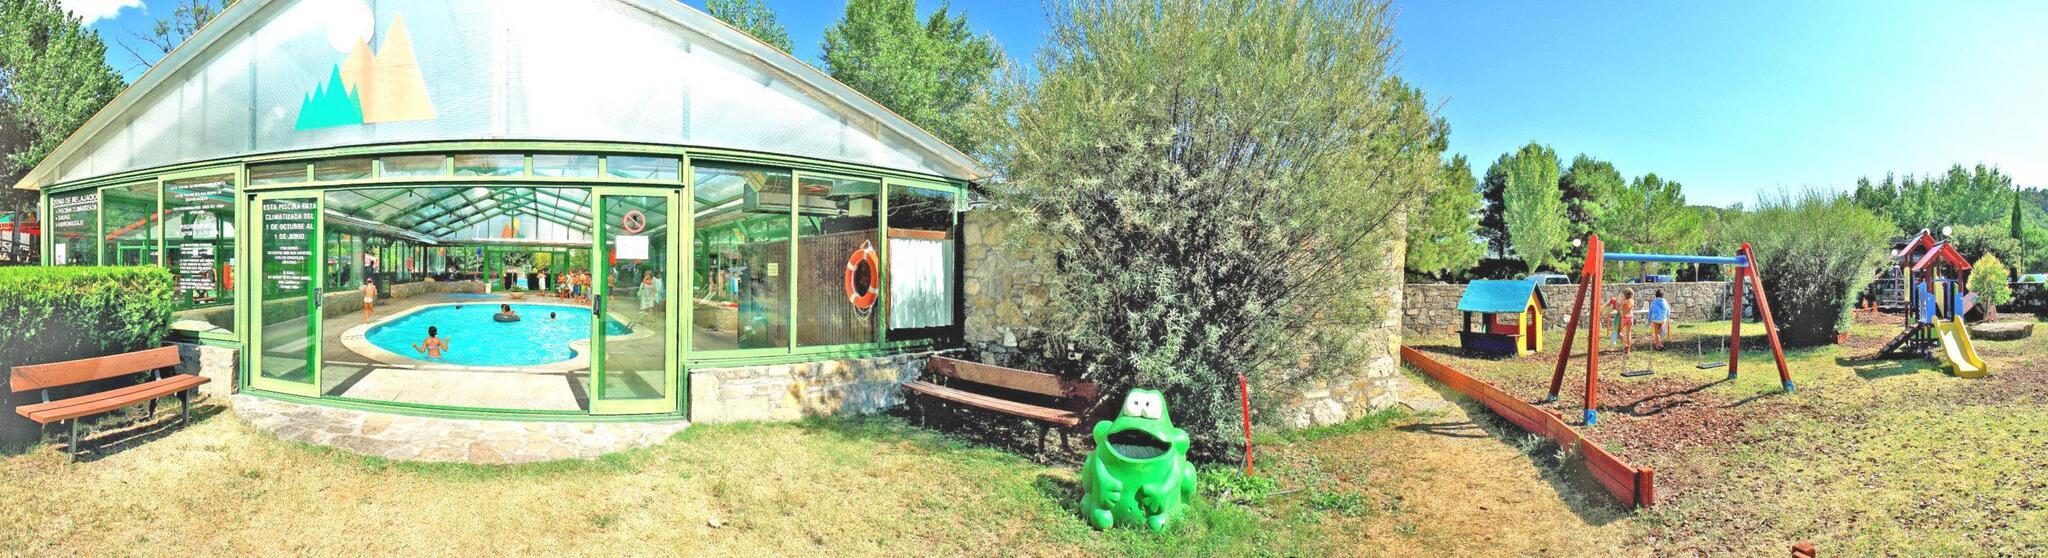 camping pena montanesa 13123